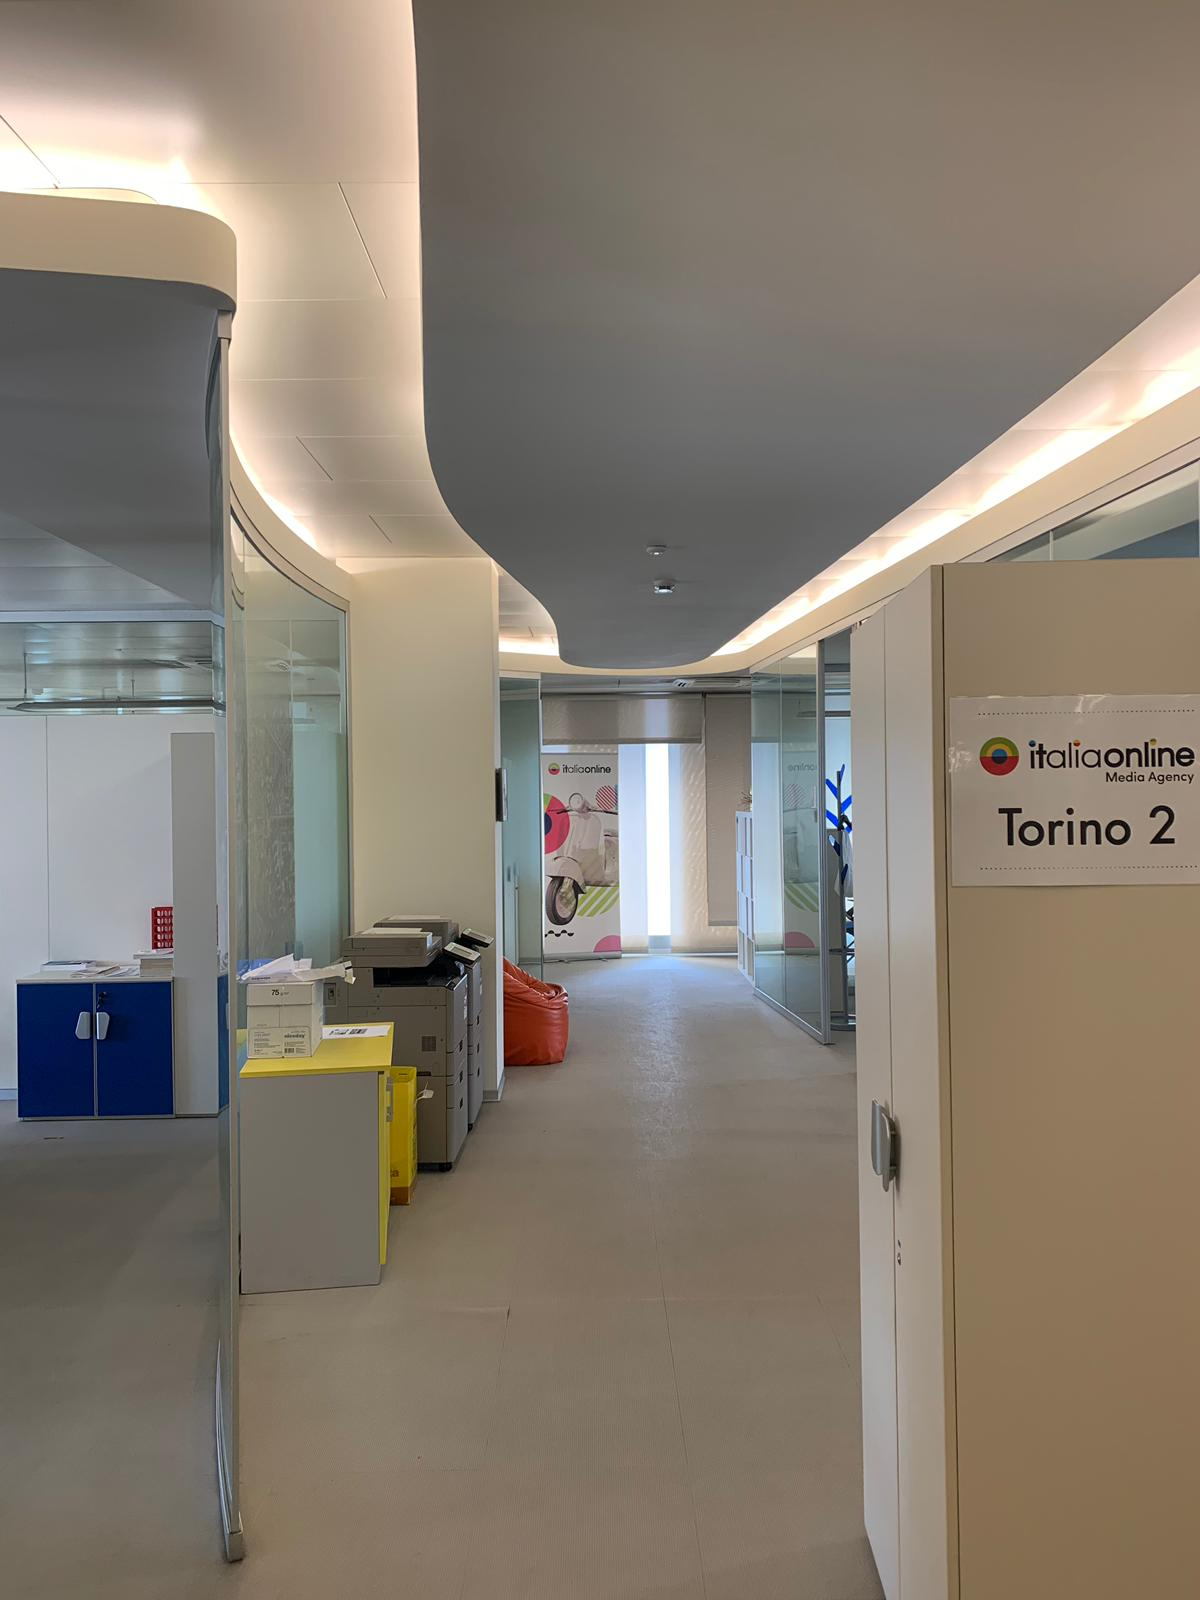 Web Agency Italiaonline Torino uffici